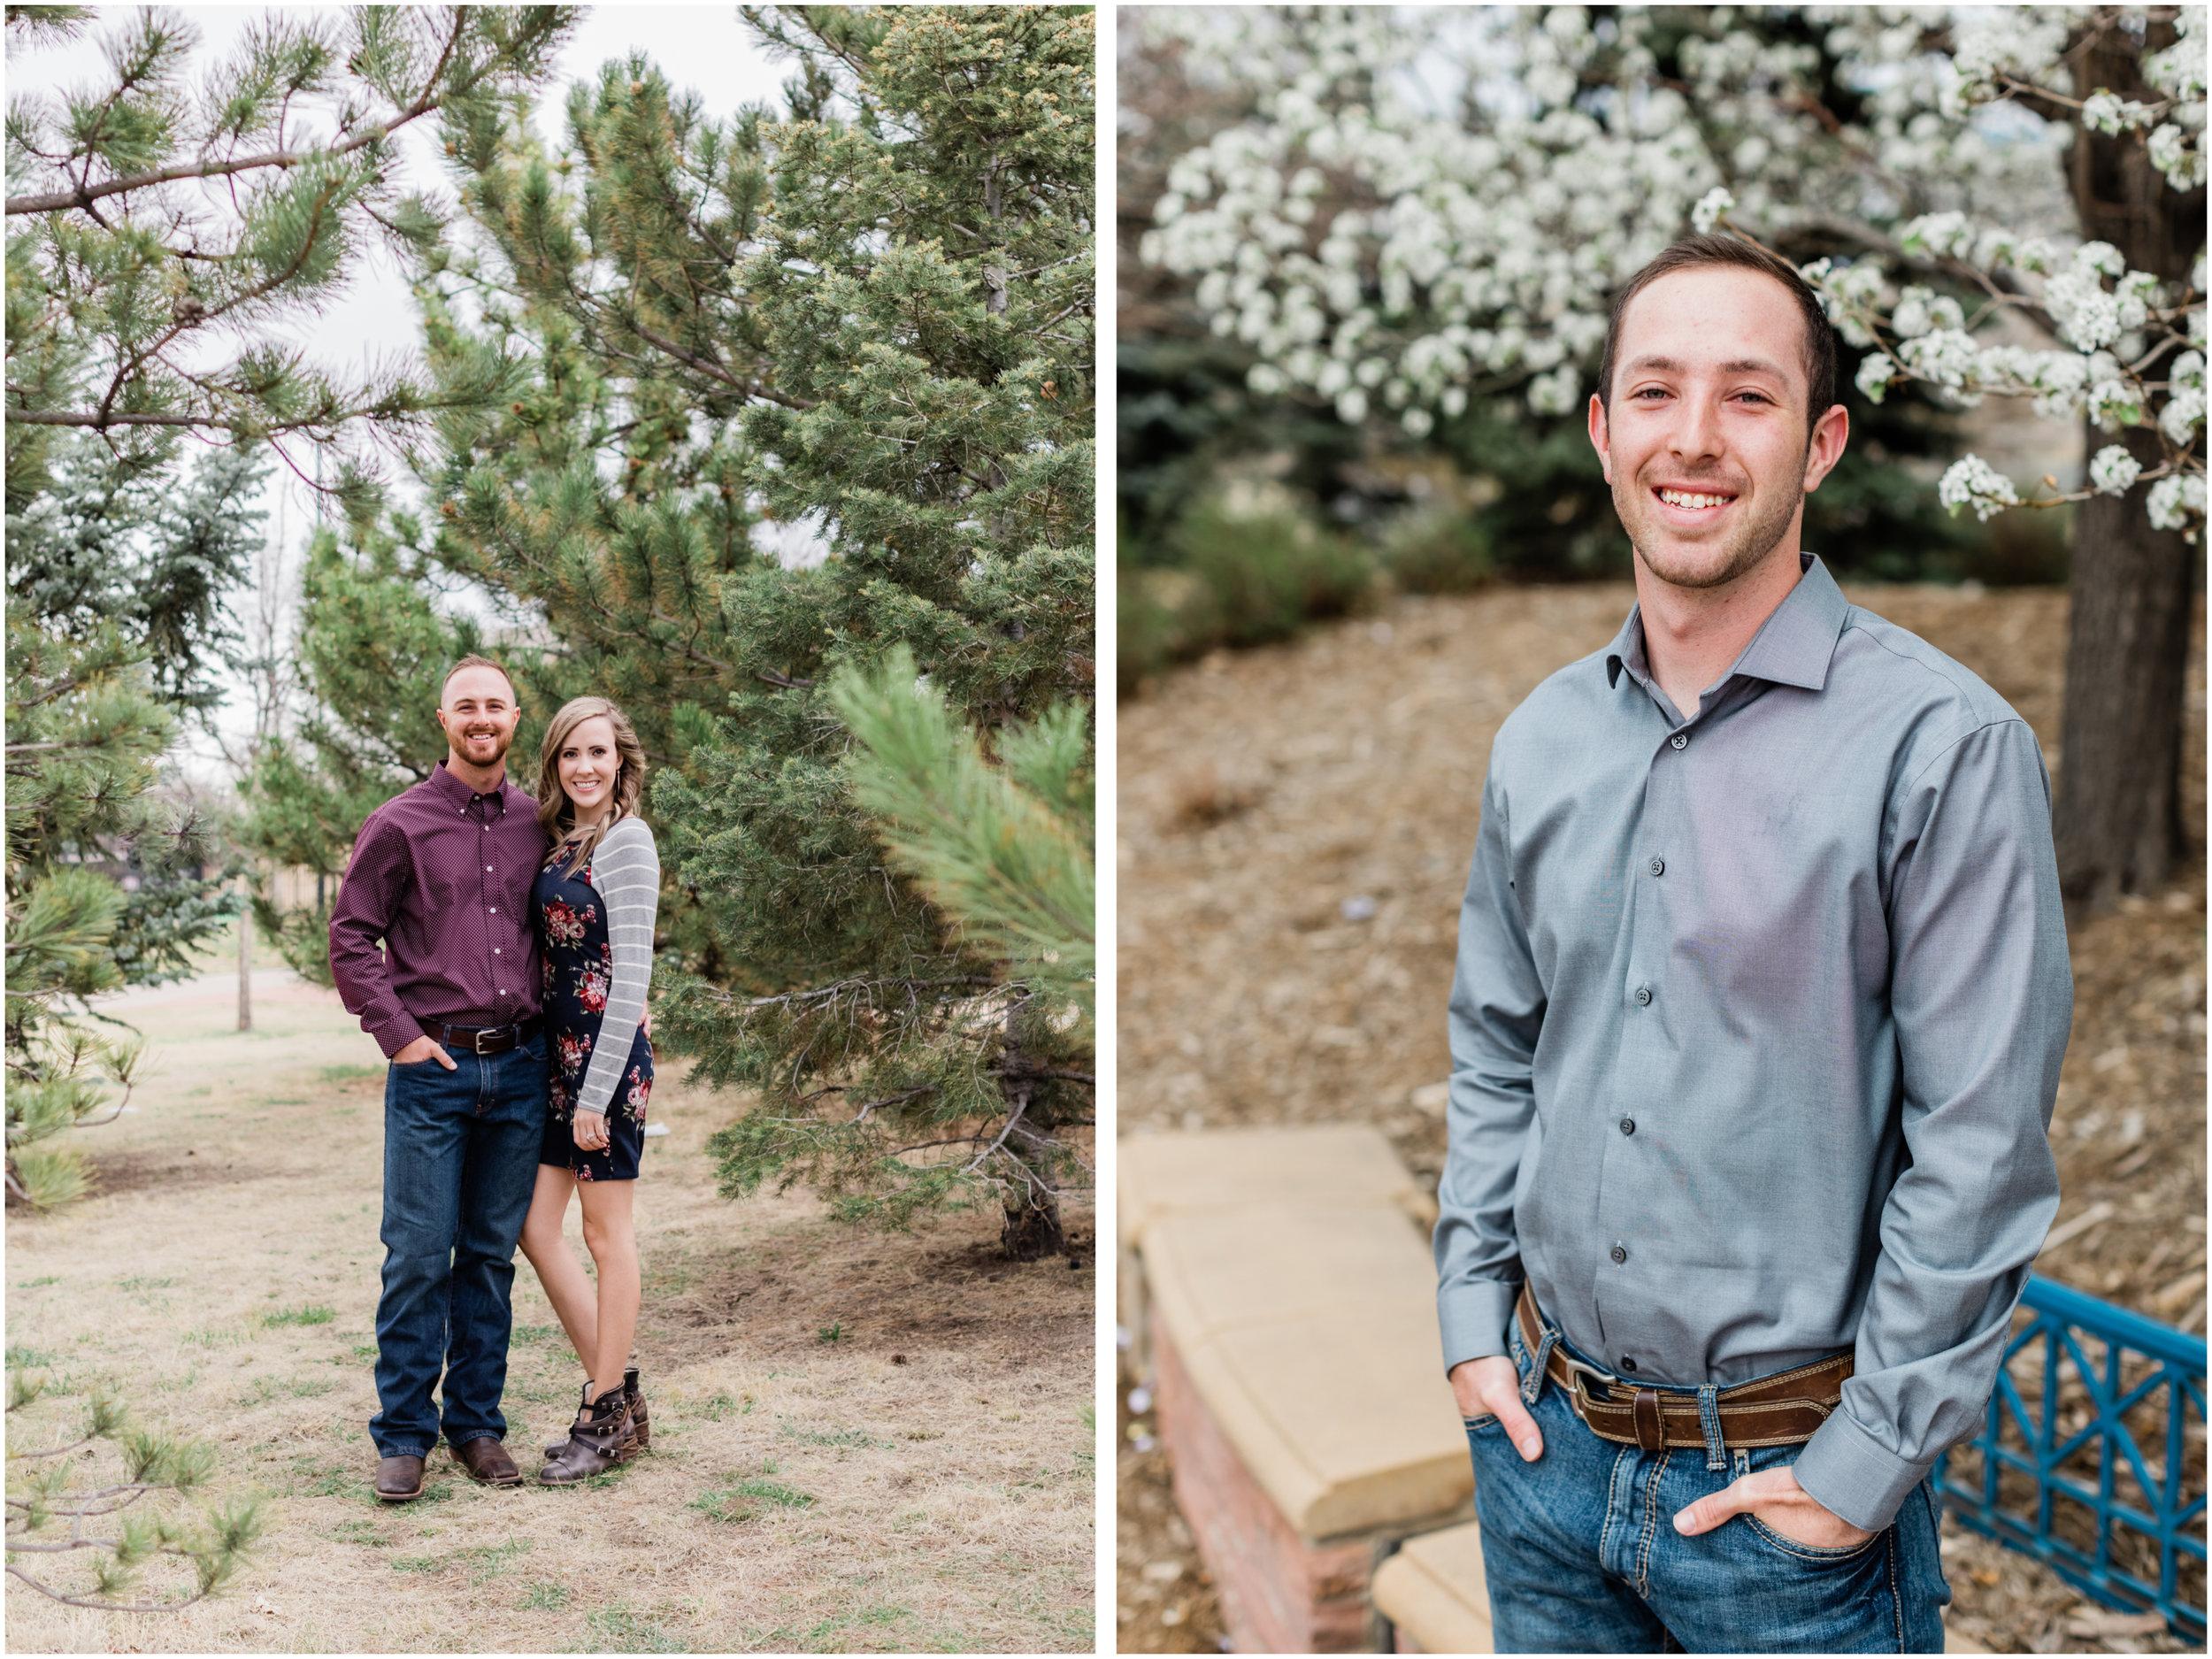 Colorado Springs Family Photographer 5.jpg